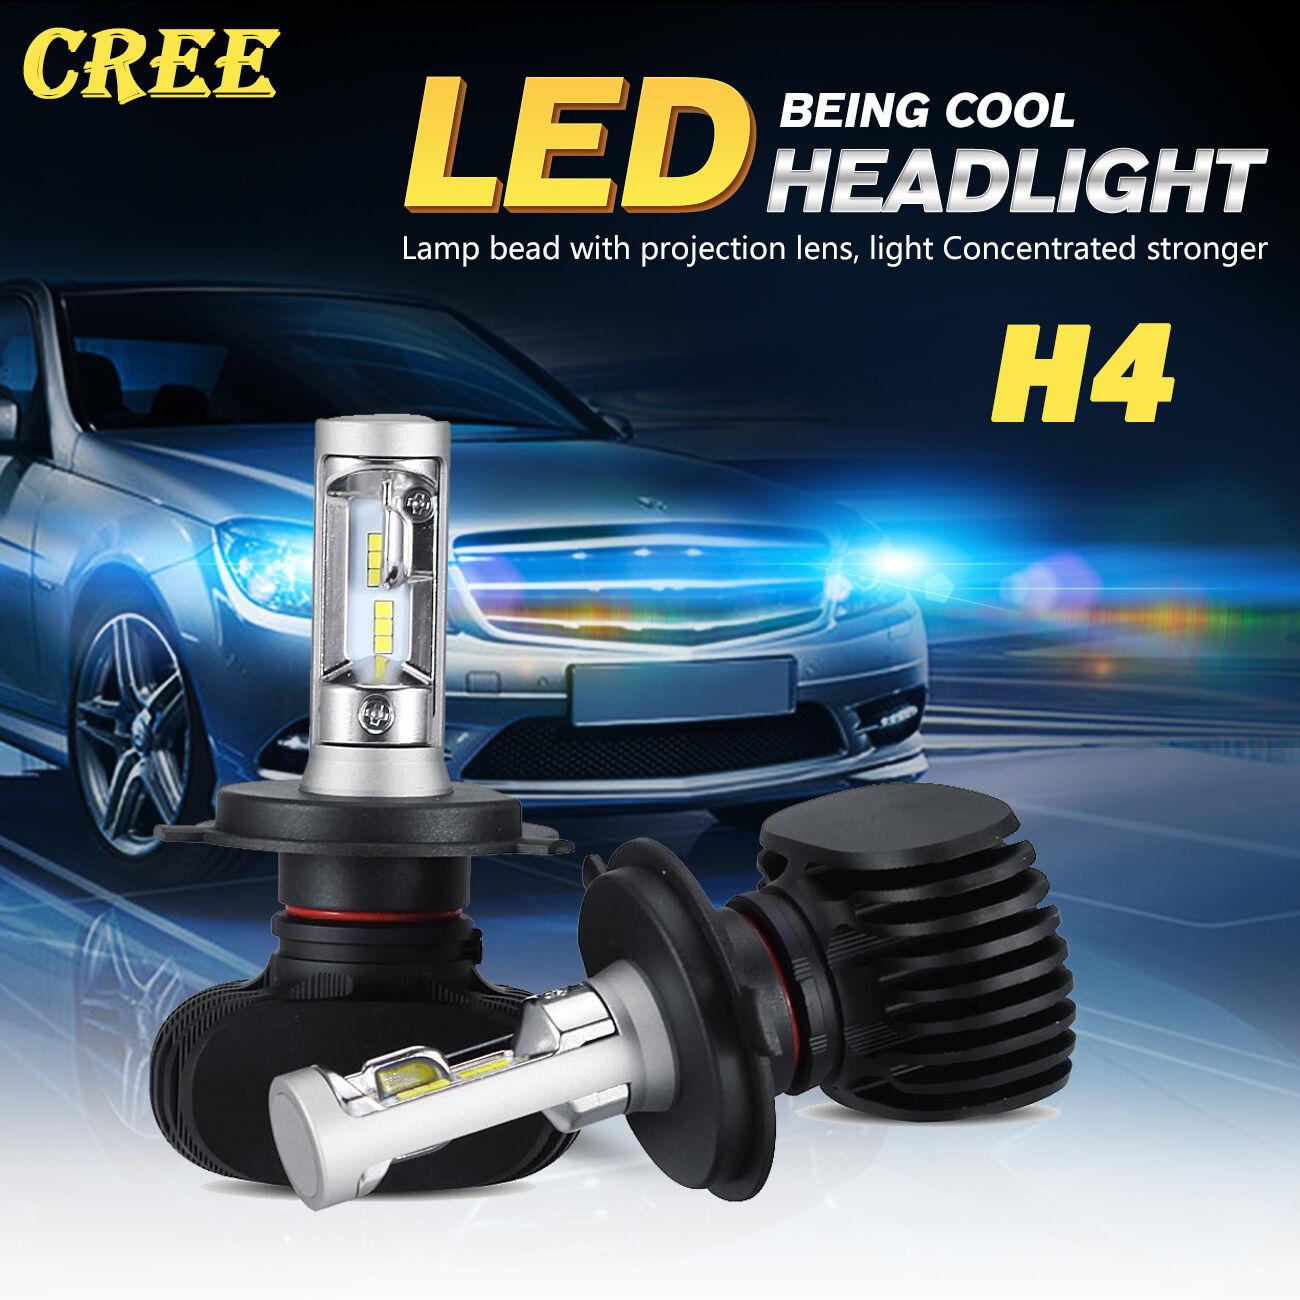 LED Verlichting auto+motor - Verkeer & Vervoer - GoT